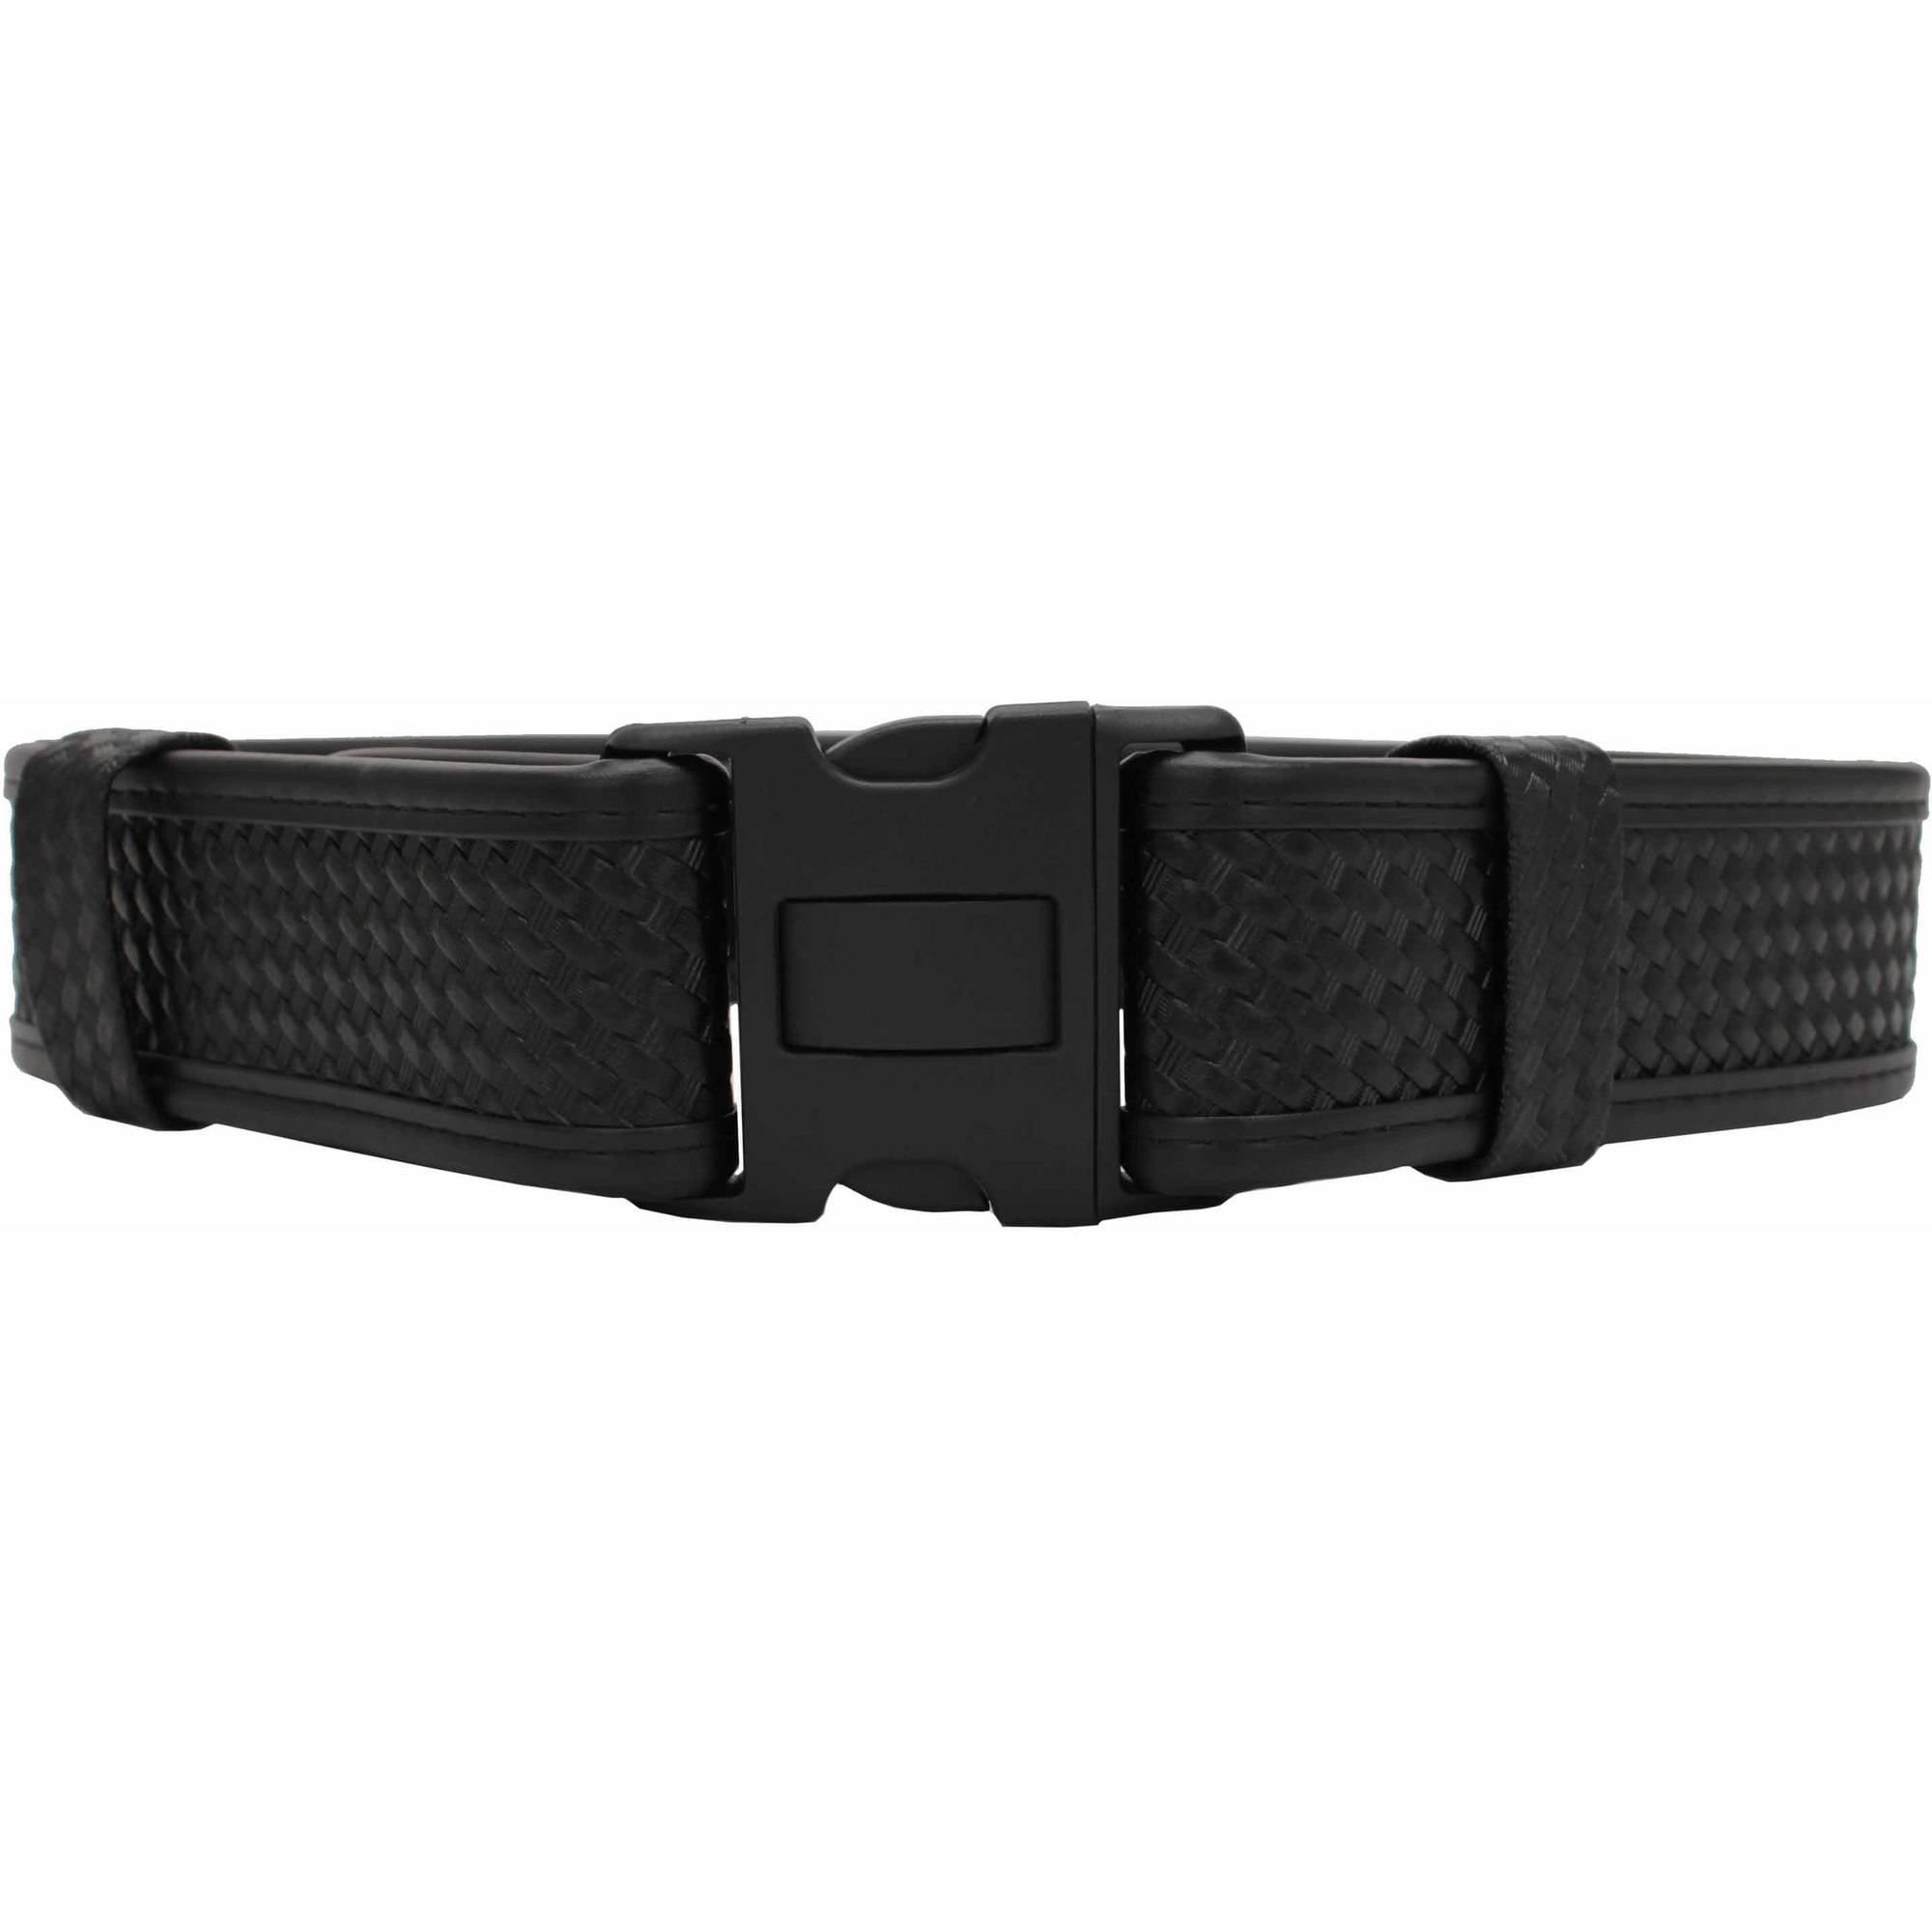 Bianchi 7950 AccuMold Elite Sam Browne Belt by Bianchi